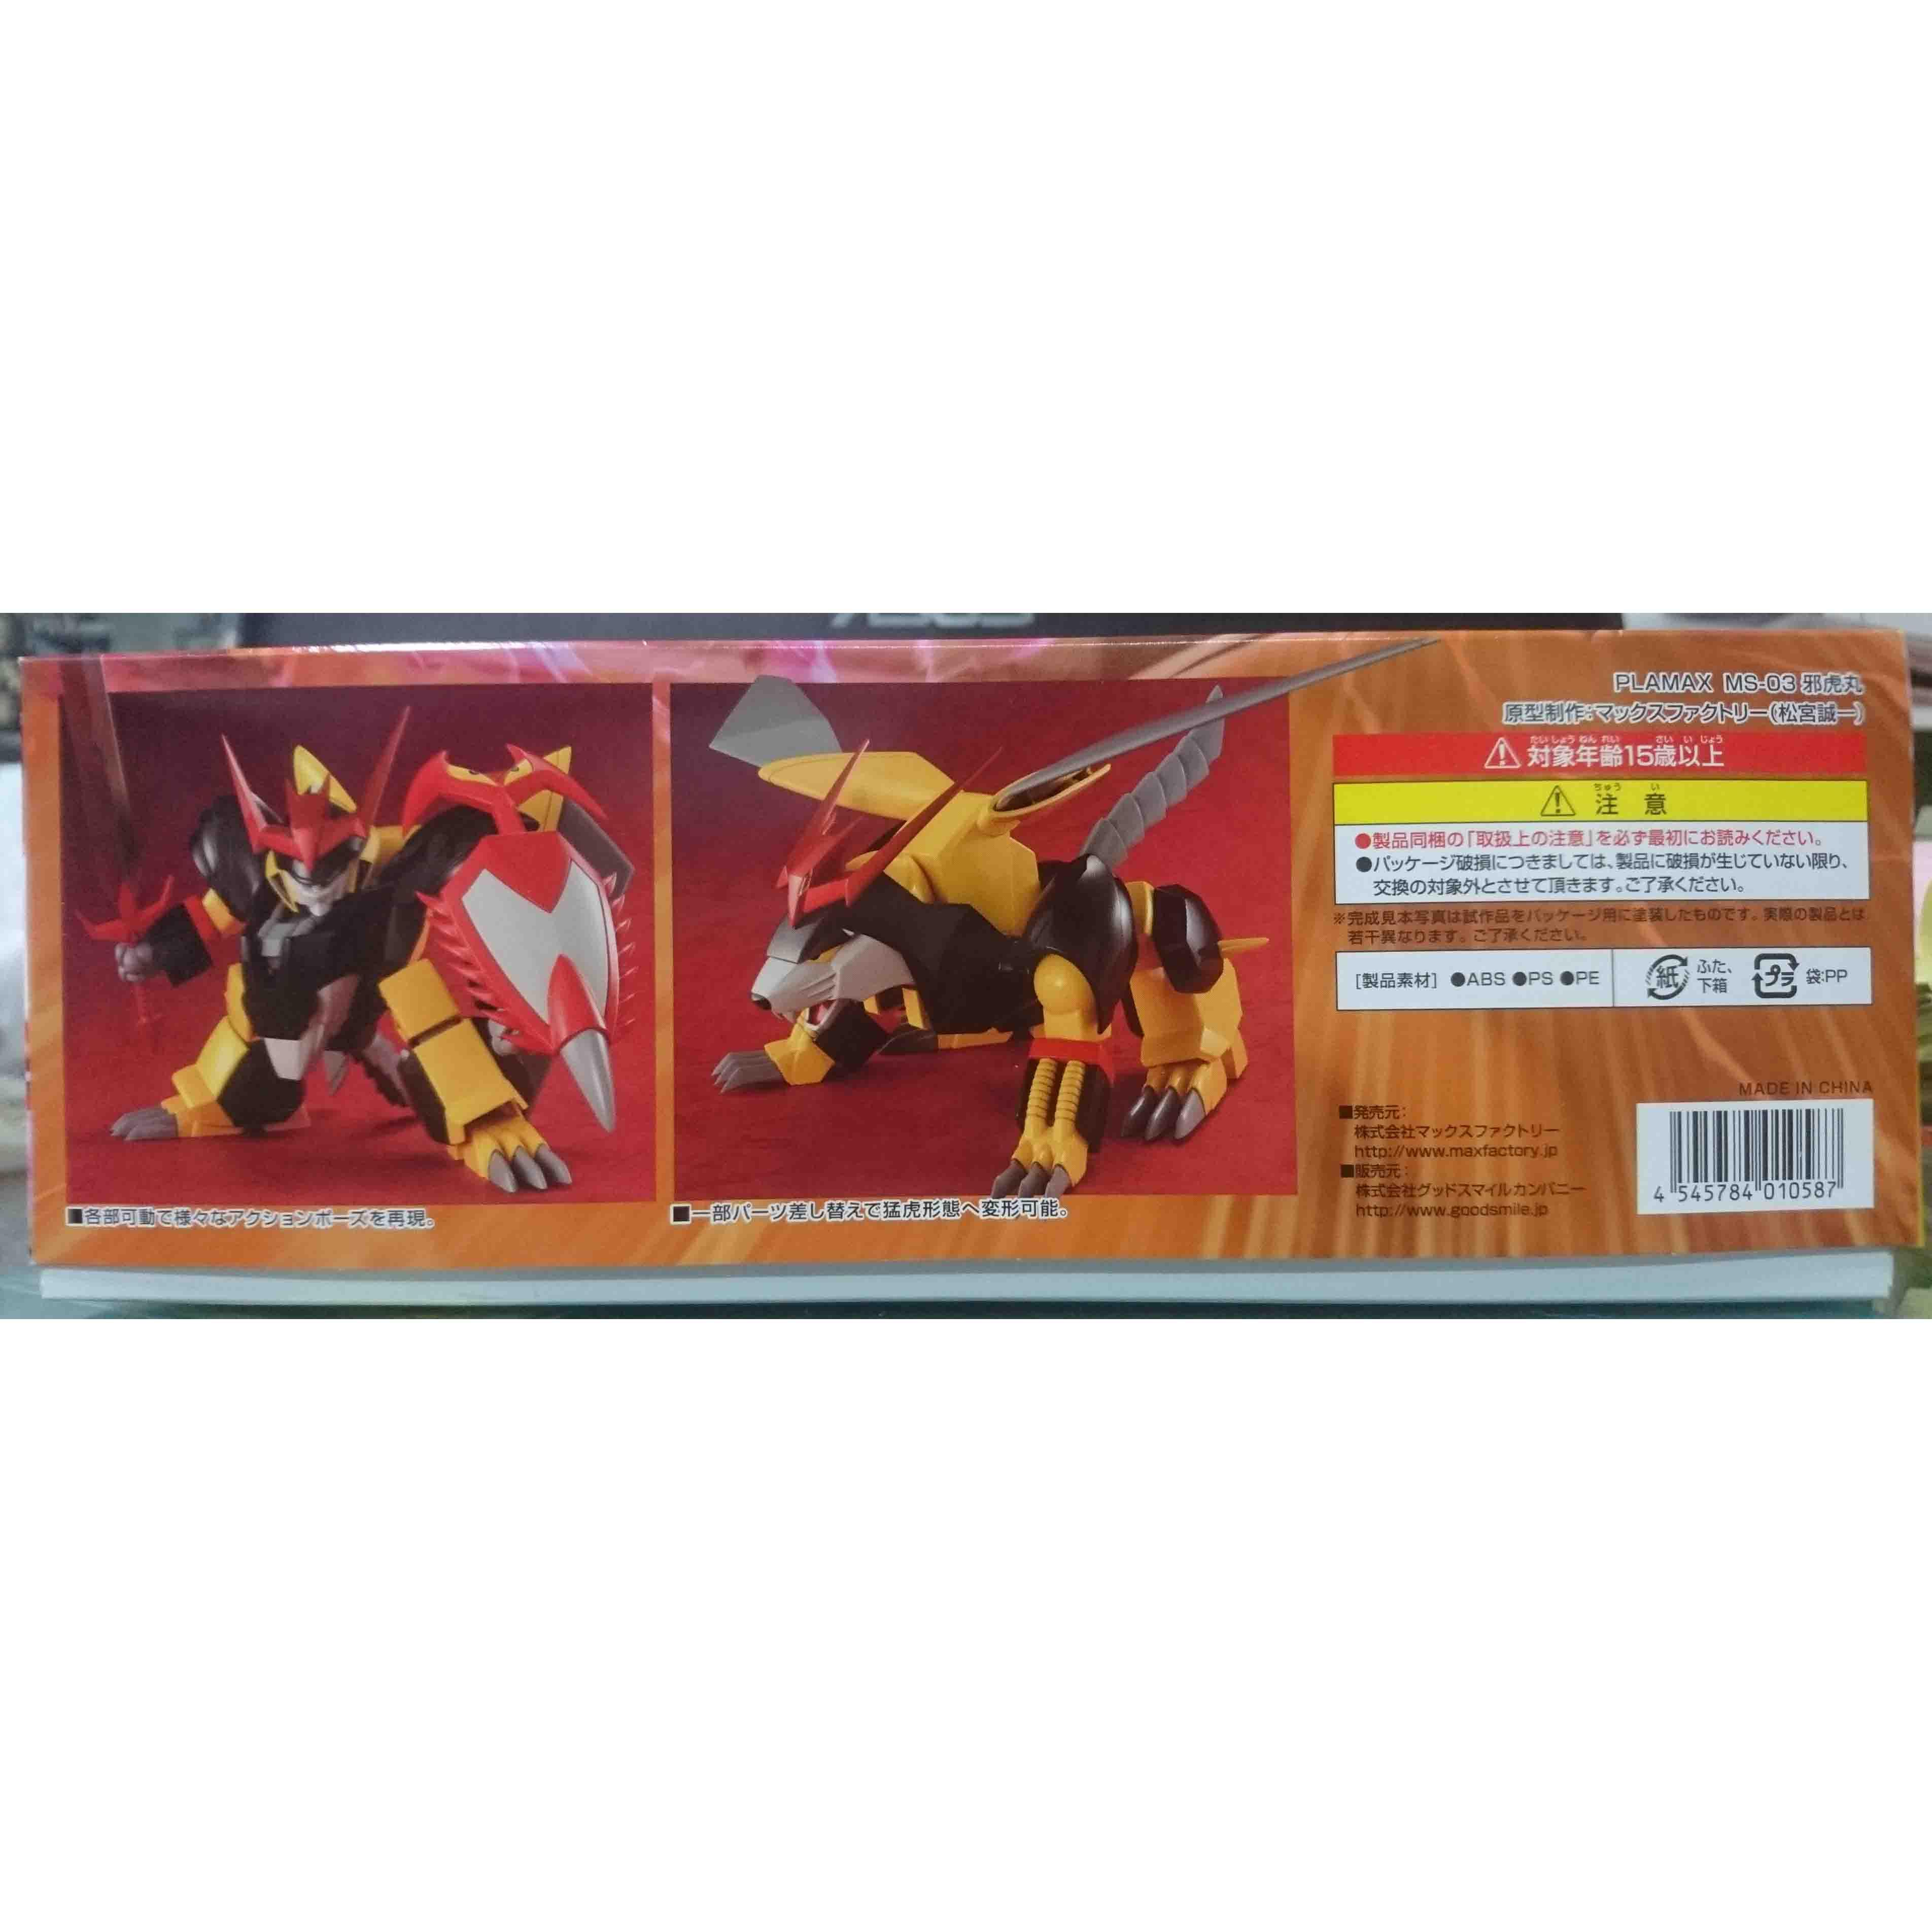 PLAMAX MS-03 邪虎丸,益祥模型玩具 外盒實際拍攝照片。